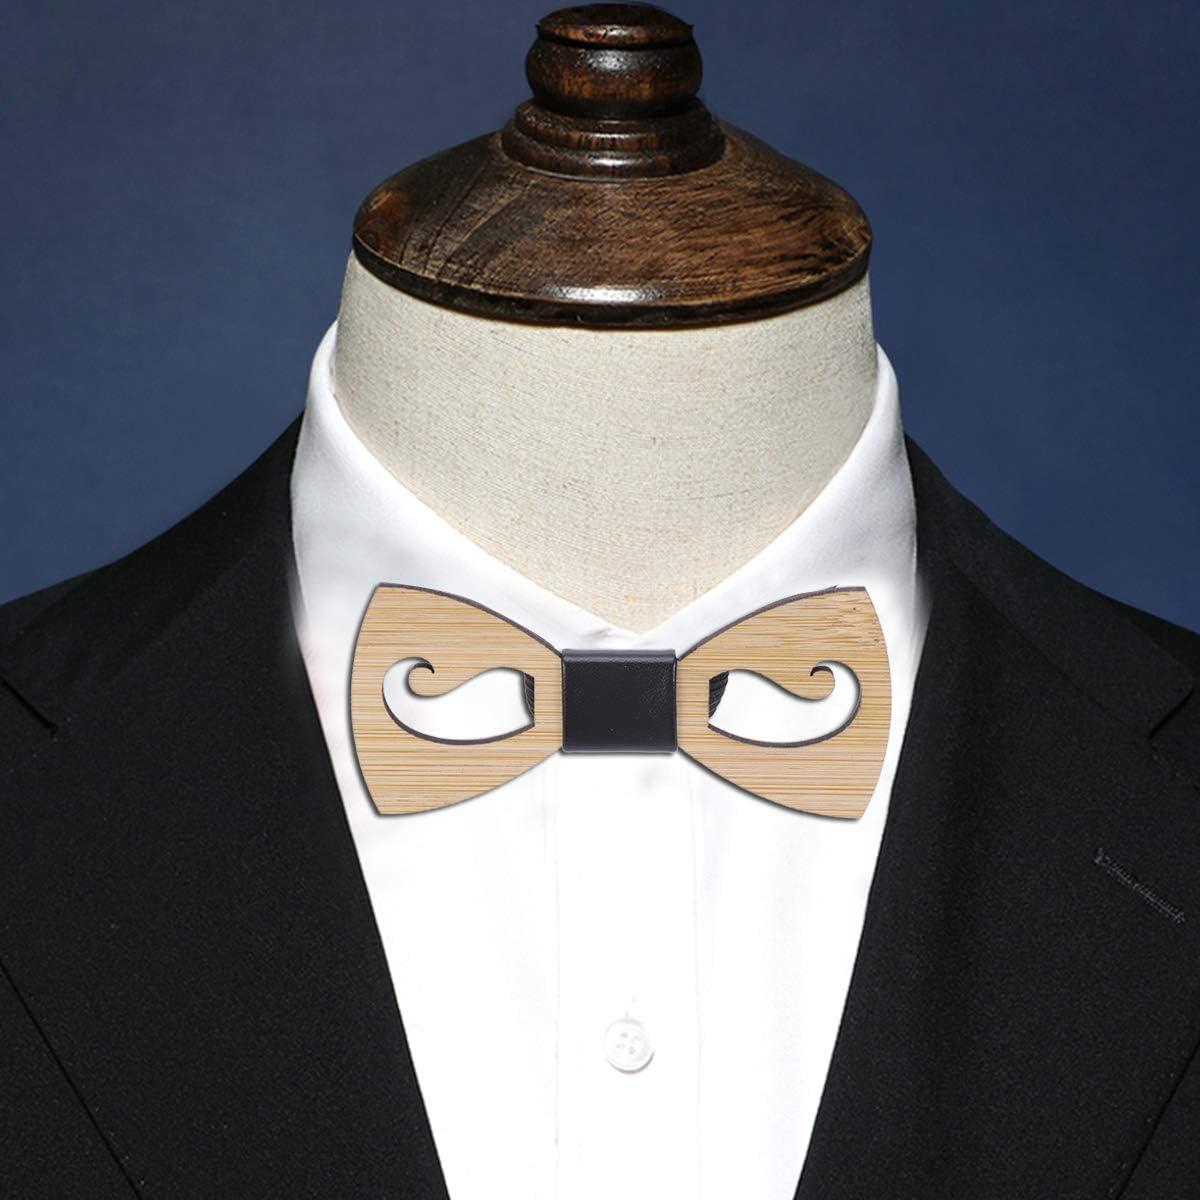 Wooden Bowtie Handcraft Pattern Bowknot Creative Hollow-out Moustache Shape Cravat Party Decor Men Dress Collar for Wedding Party for Party Supplies